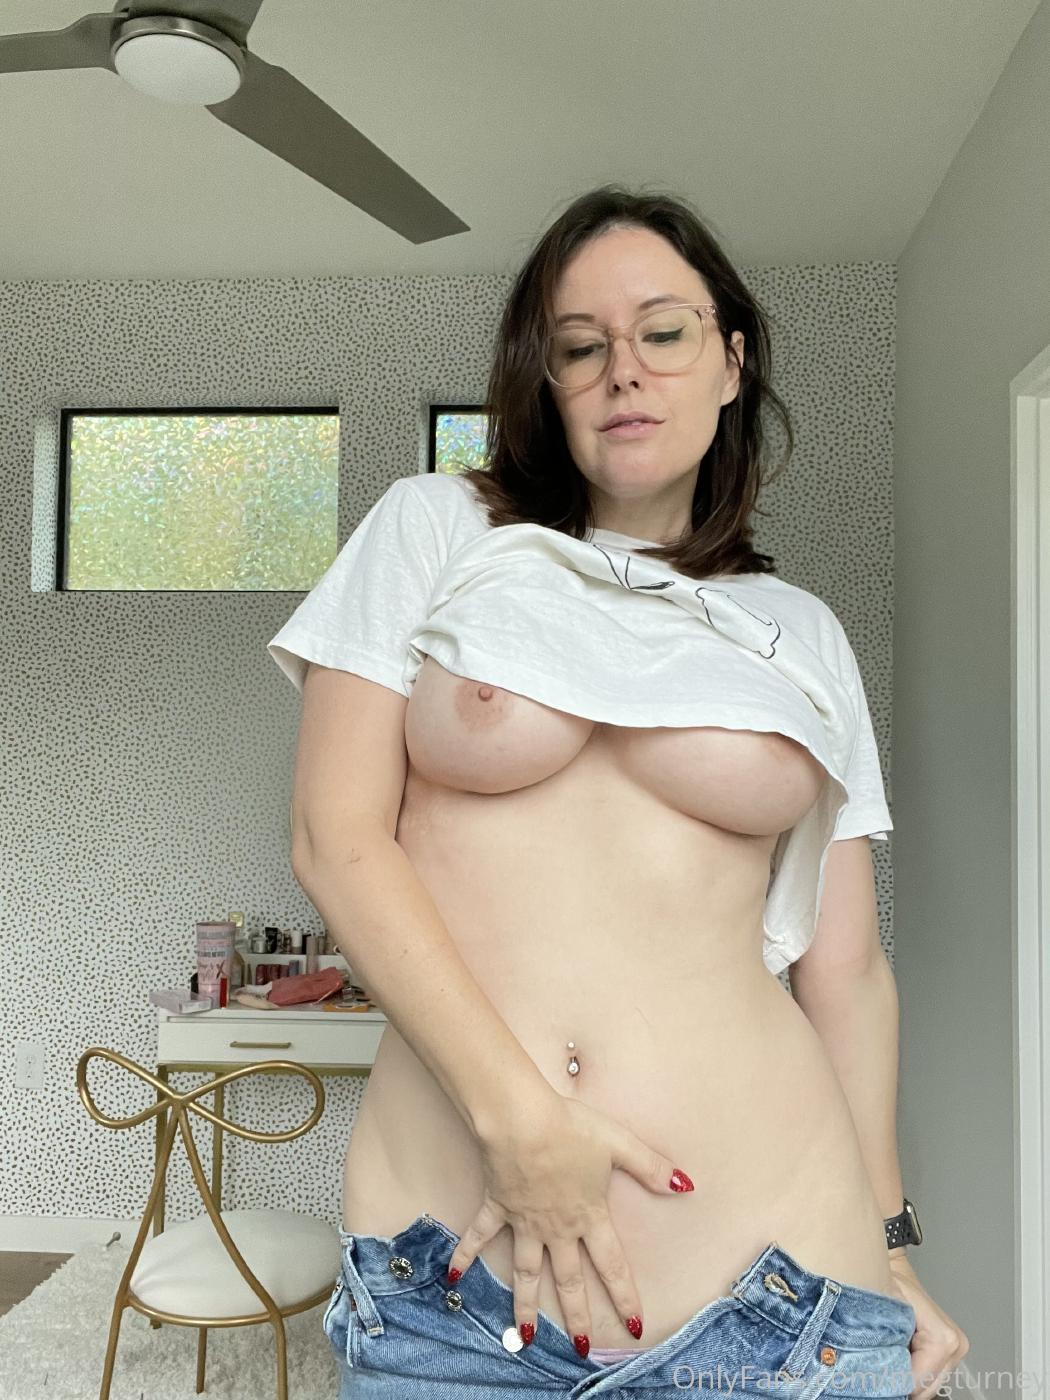 Meg Turney Nude Stripping Onlyfans Set Leaked